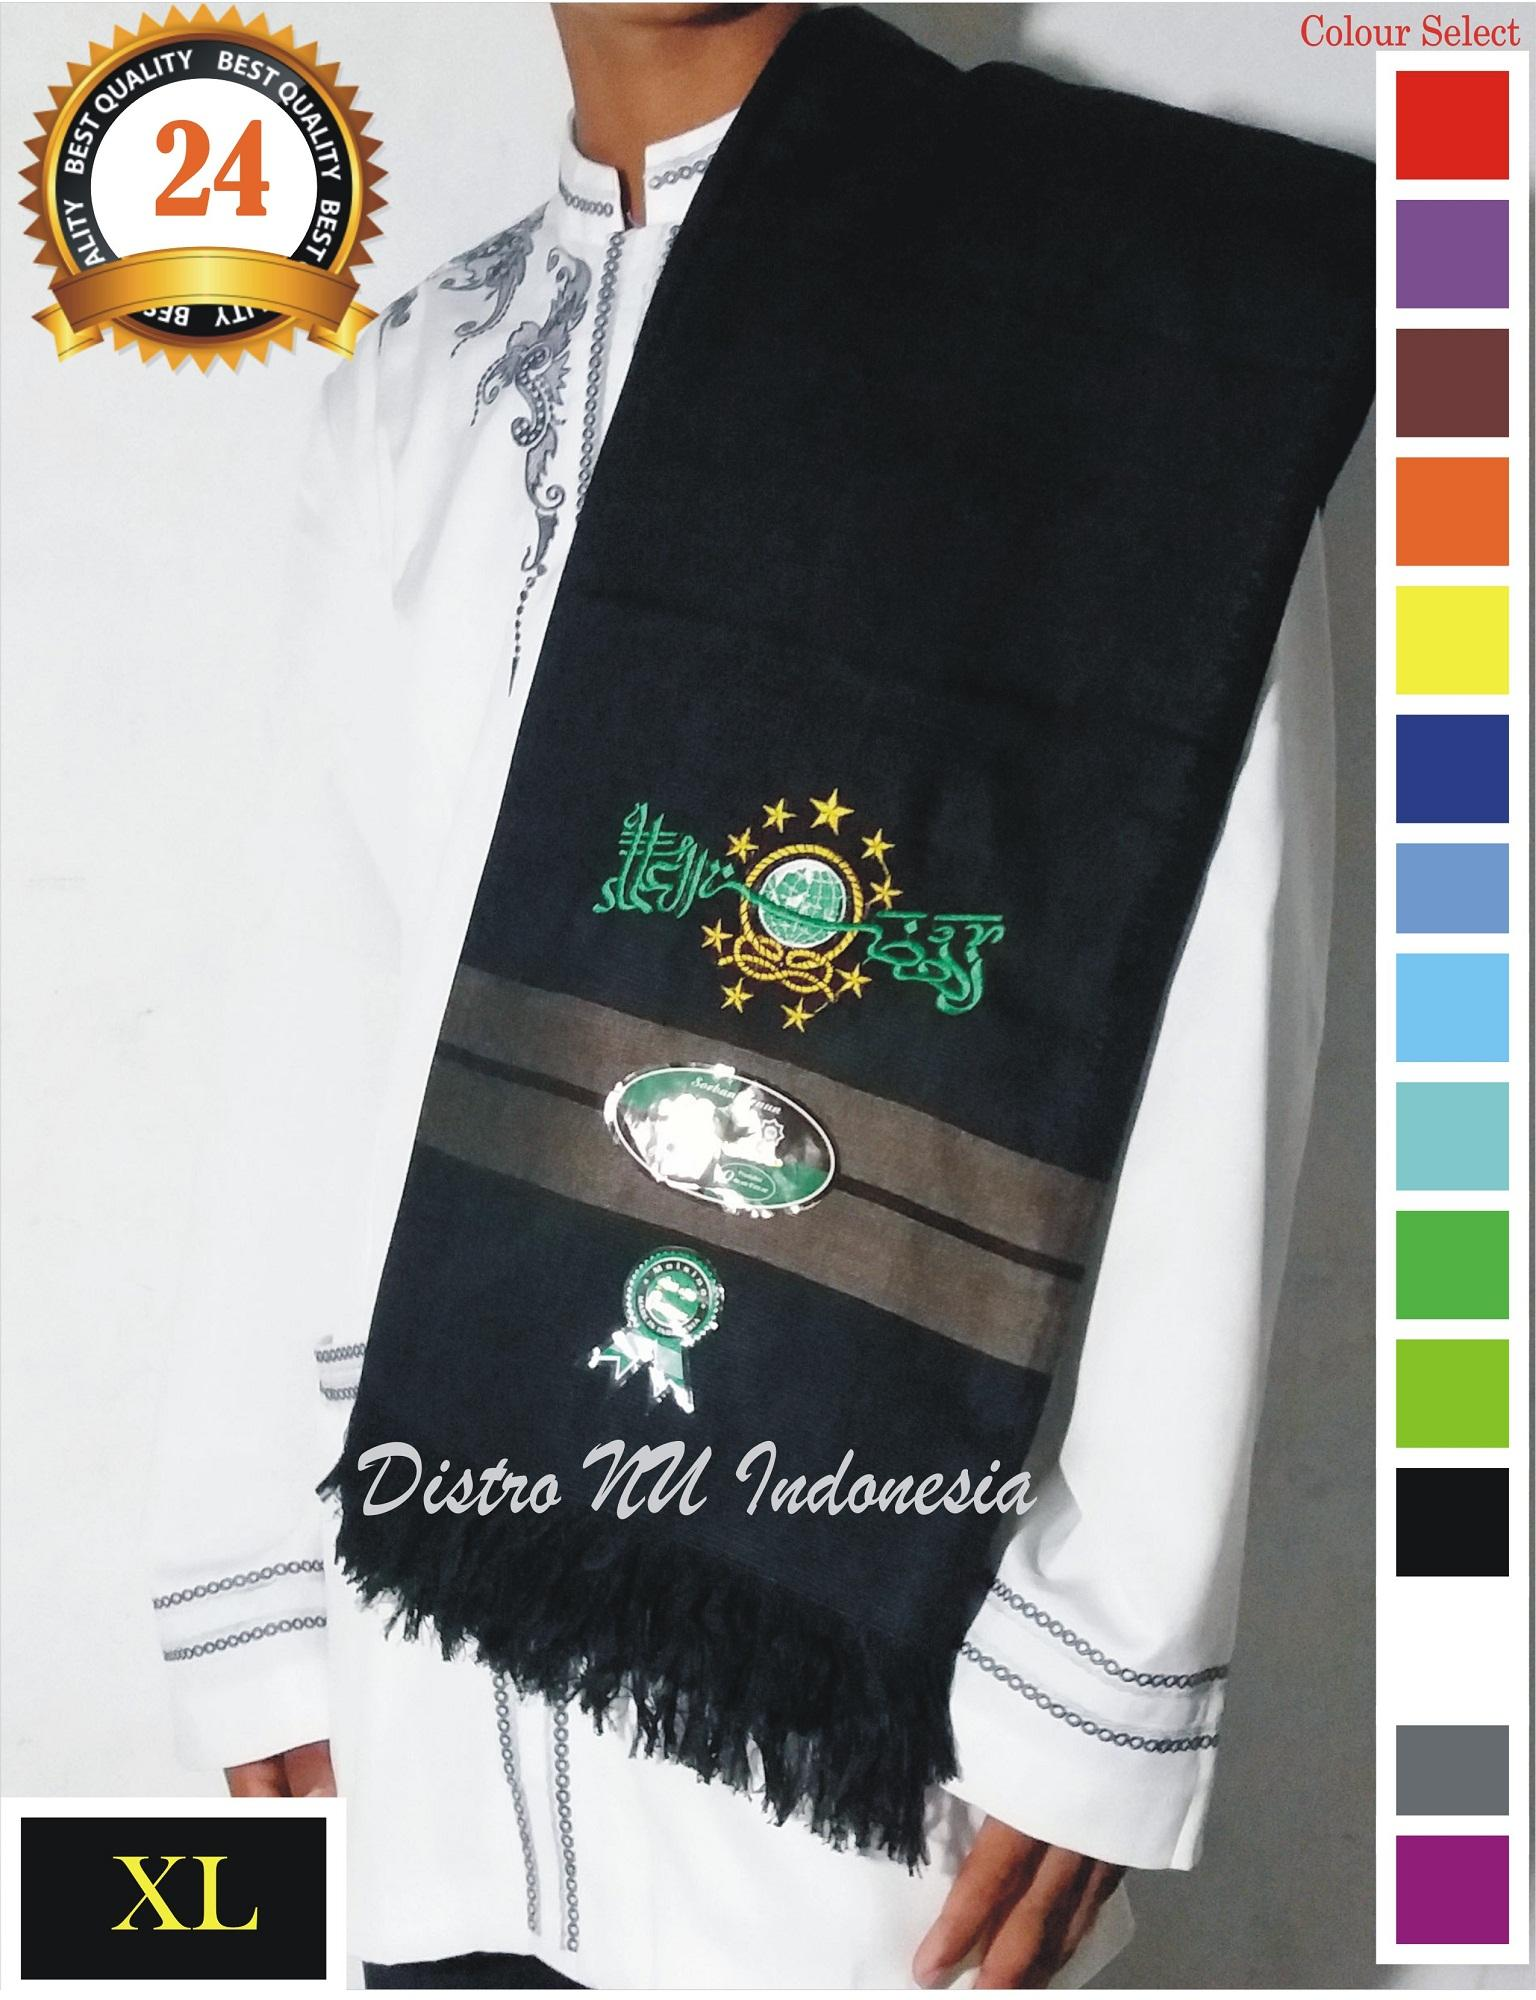 SORBAN NU XL BORDIR TEBAL BAGUS TENUN MO HITAM DPN COKLAT / surban / sajadah / sarung / batik nu / jasko / koko / busana muslim / peci / songkok / gamis / jubah / sarung nu / jas nu / jasket / kerudung baru / baju wanita / kemeja / kaos distro